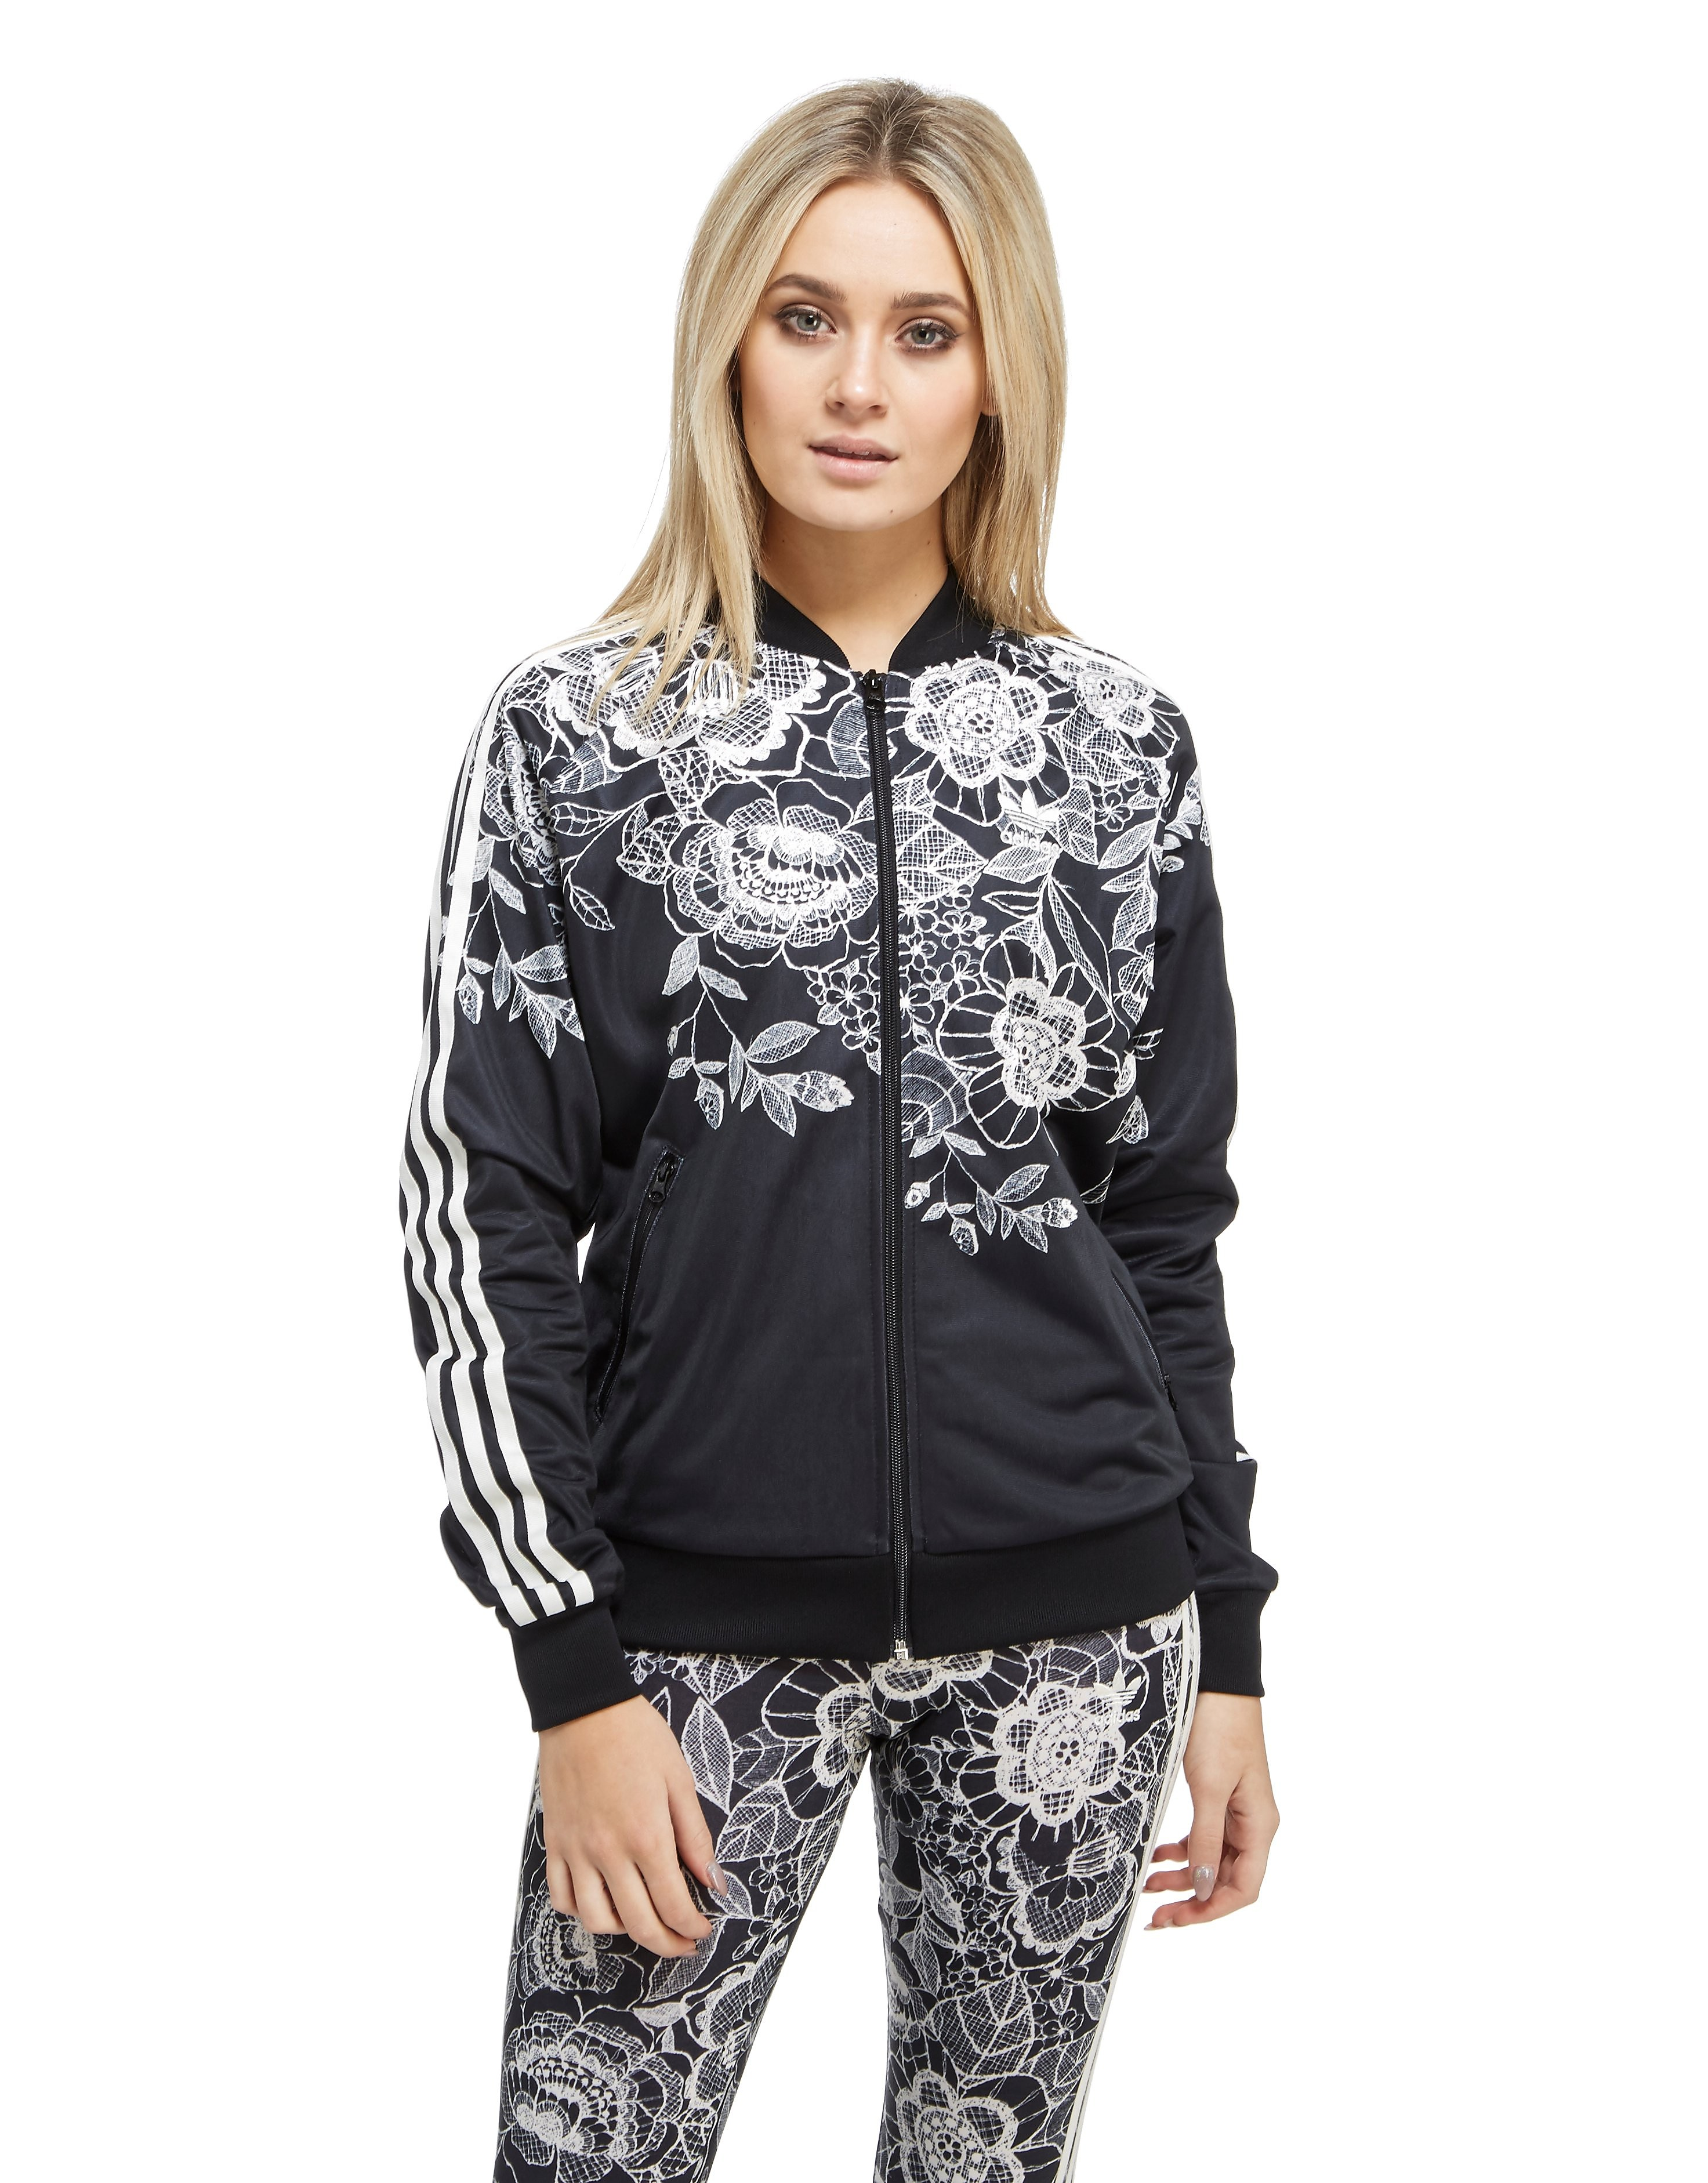 adidas Originals FARM Florido Superstar Track Jacket